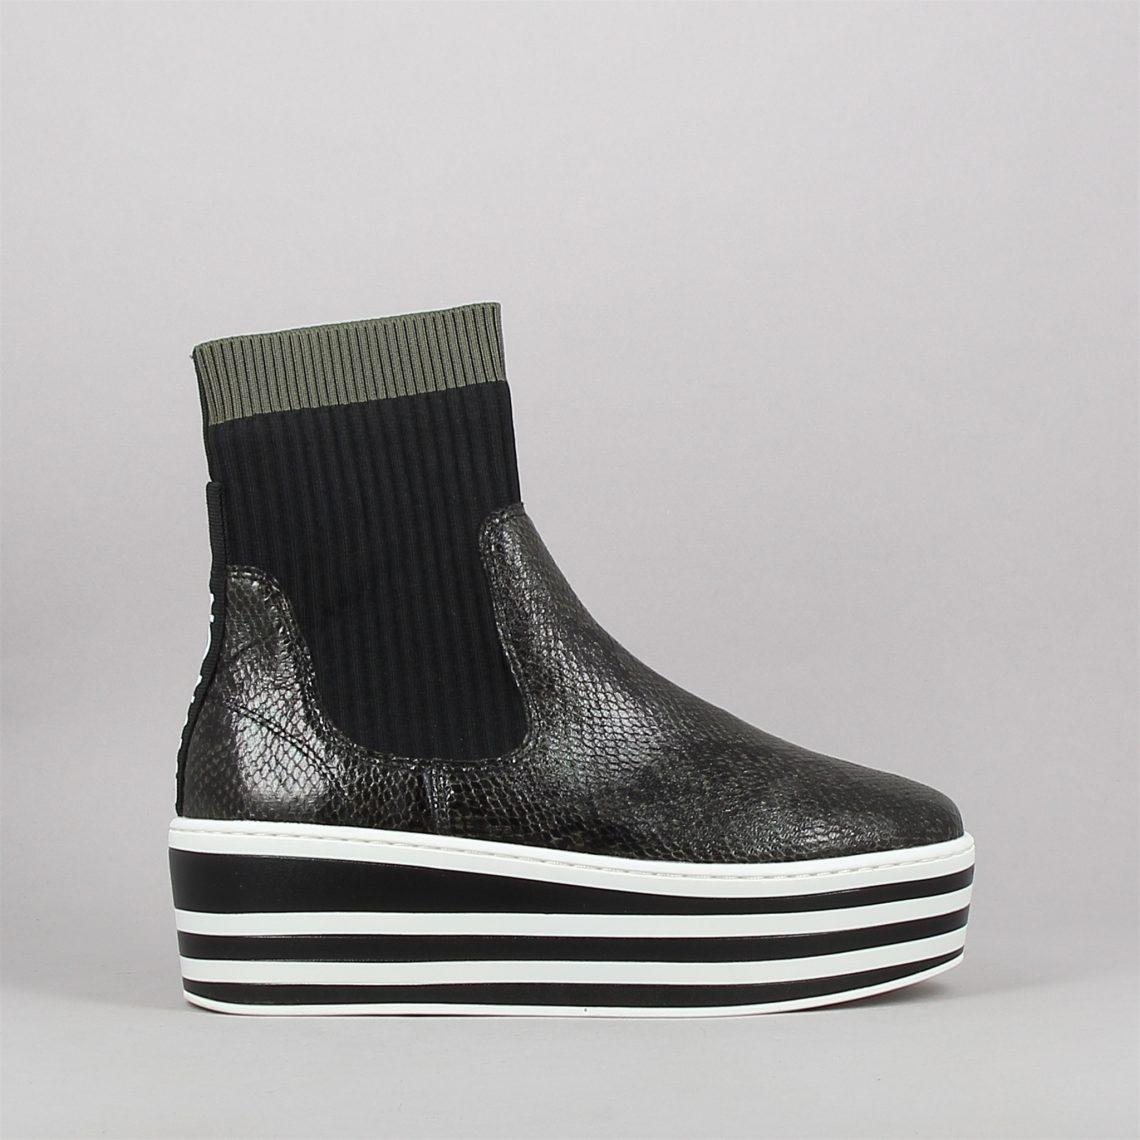 boost socks h2021